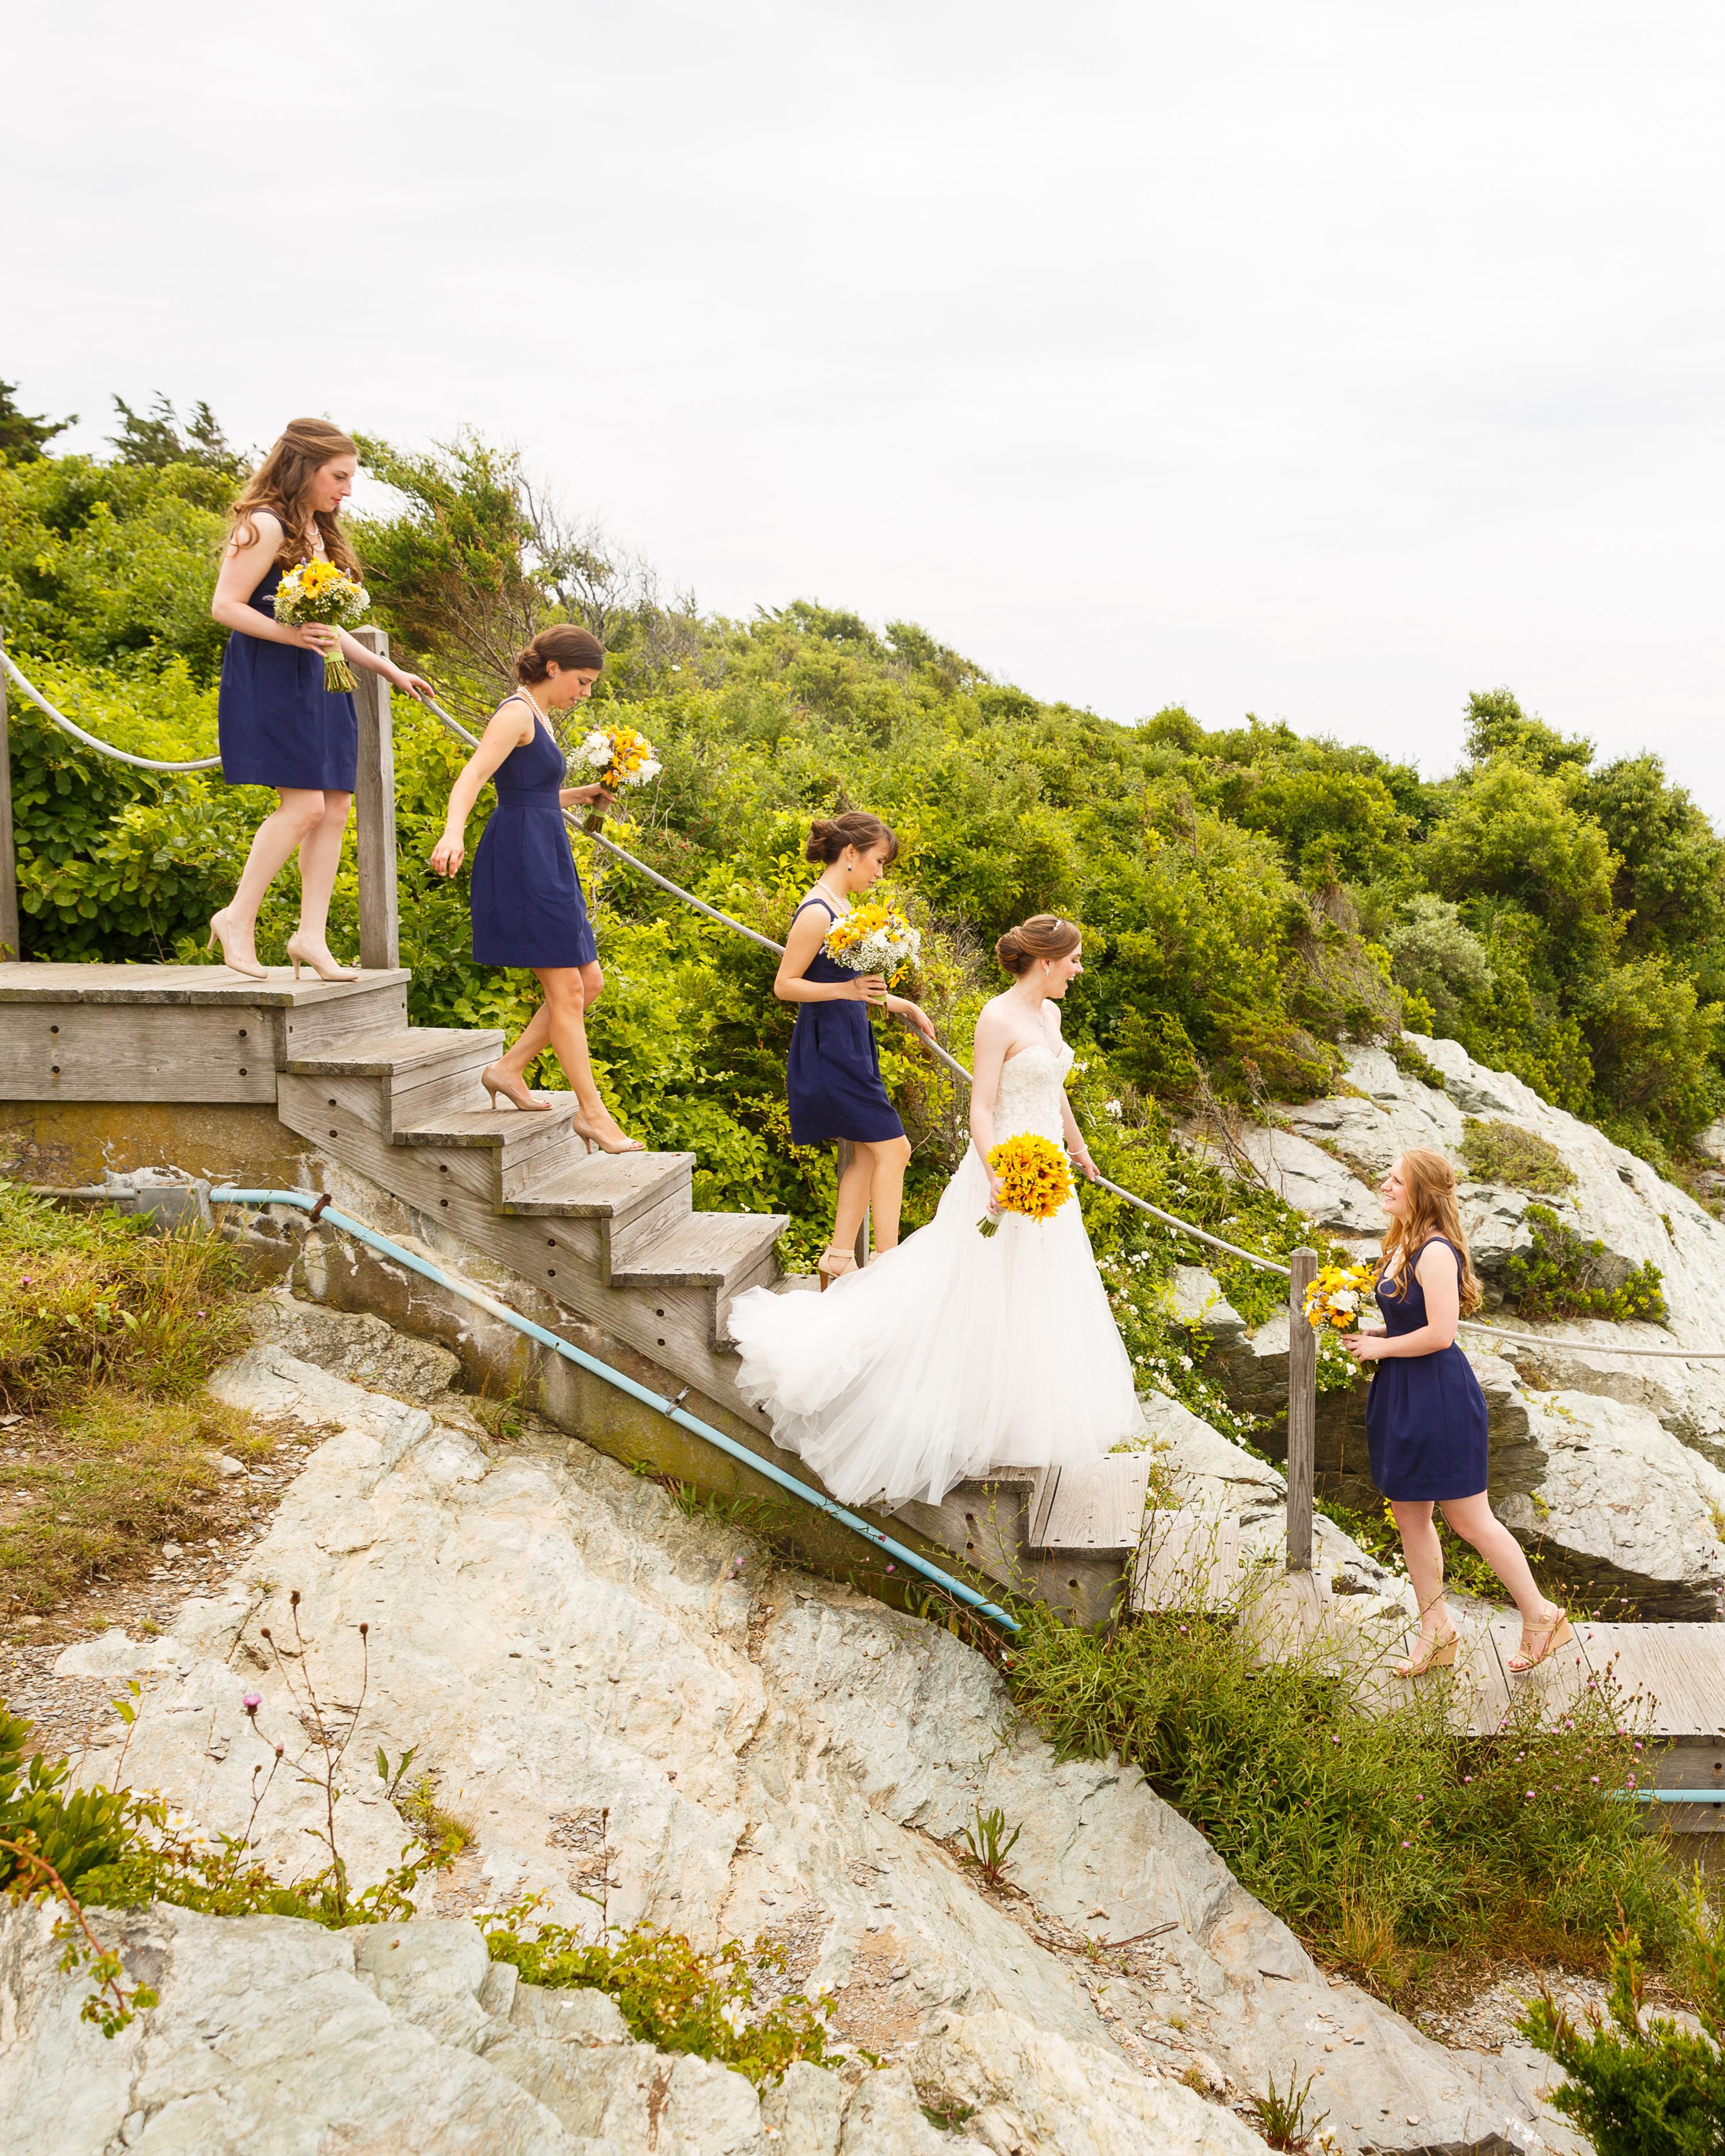 kristel-austin-wedding-bridesmaids-0463-s11860-0415.jpg